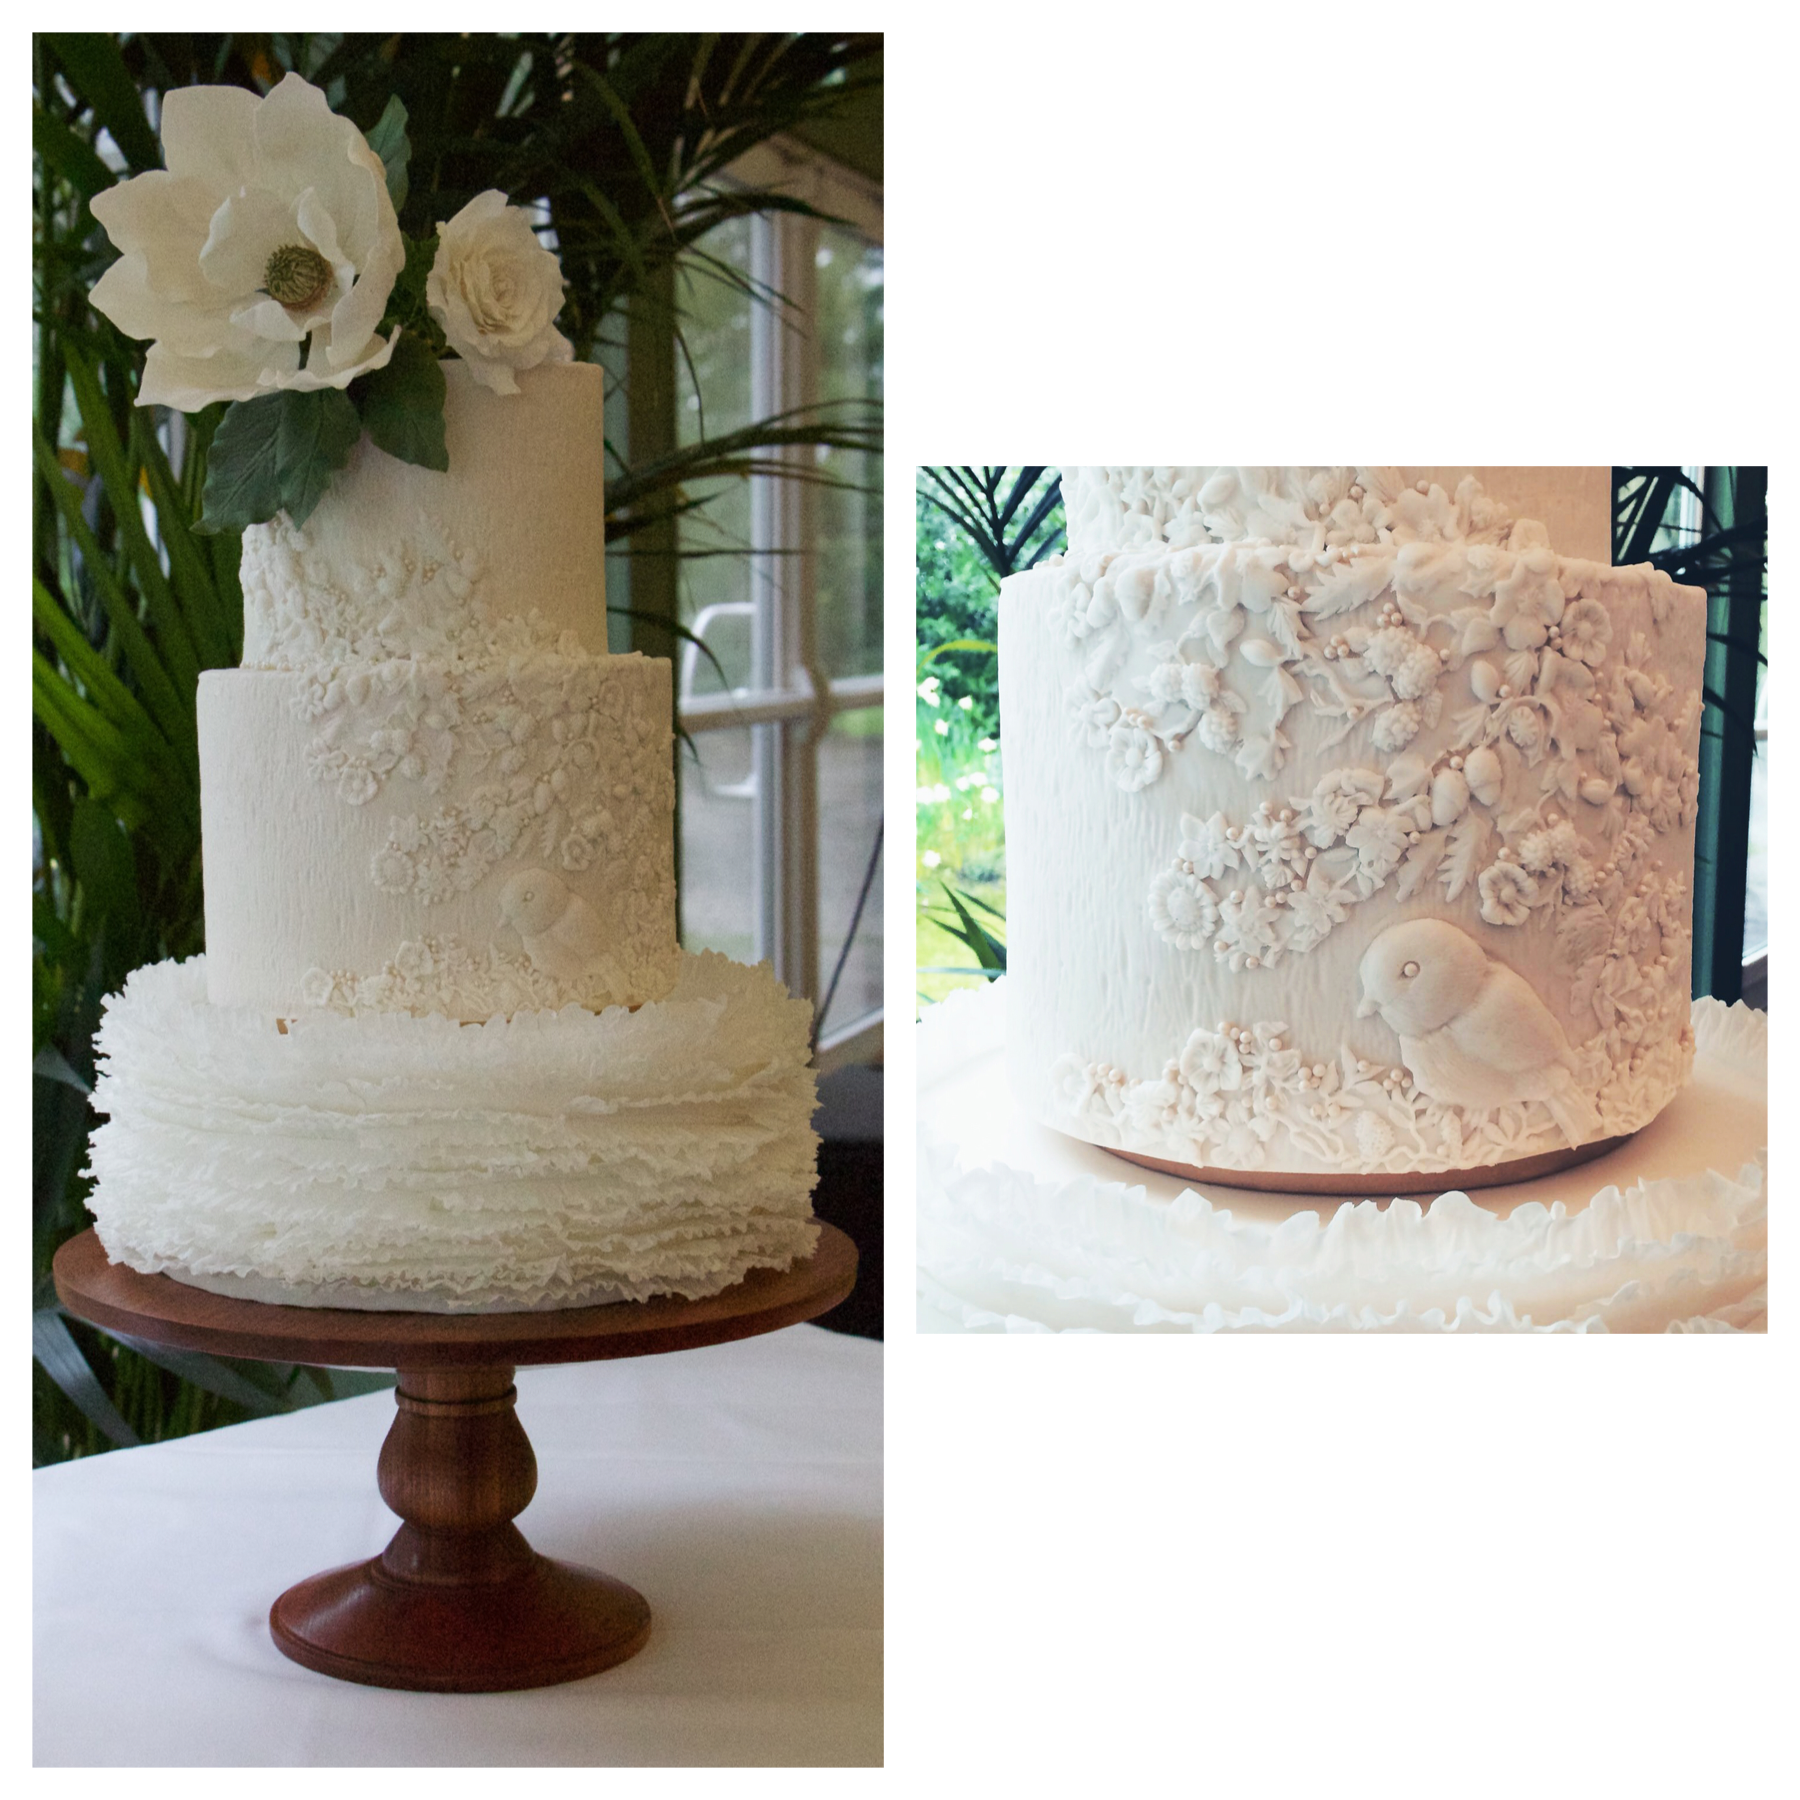 Relief Work Wedding Cake Trend